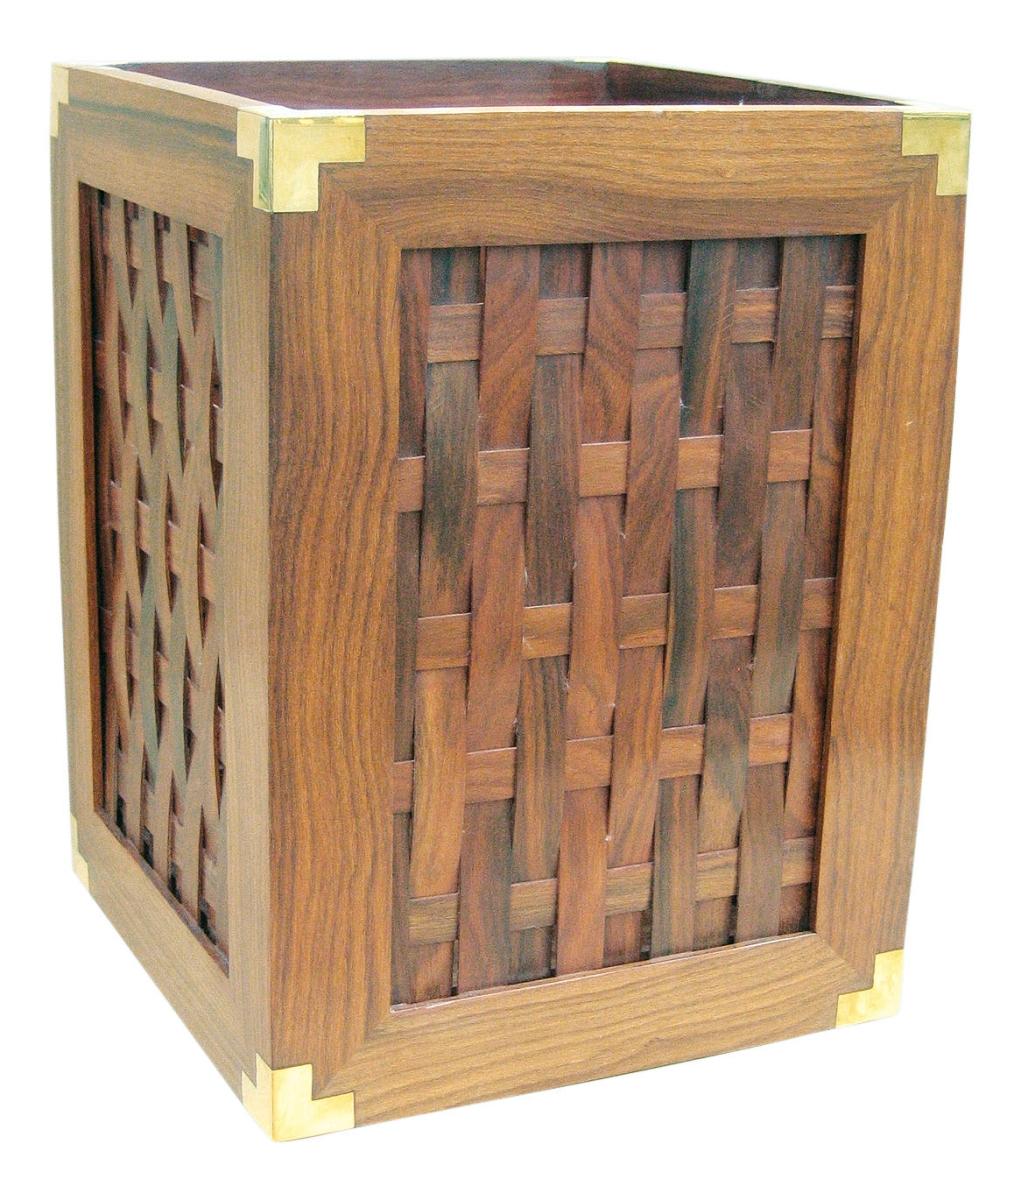 papierkorb sea4you maritime deko und geschenkartikel. Black Bedroom Furniture Sets. Home Design Ideas